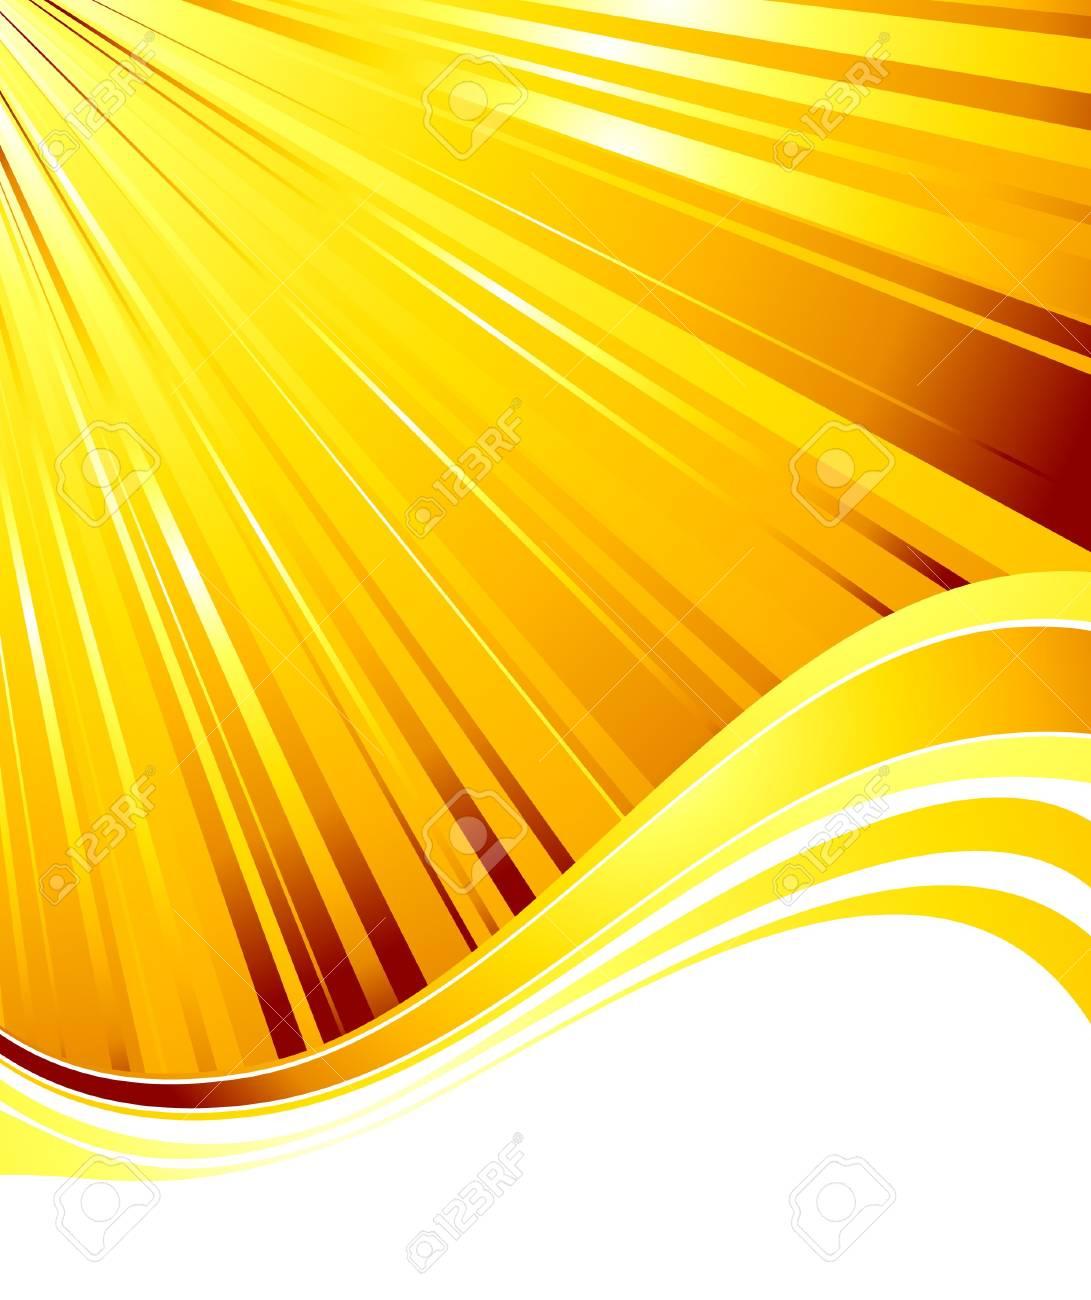 Sunburst abstract summer card.  illustration Stock Vector - 7240857